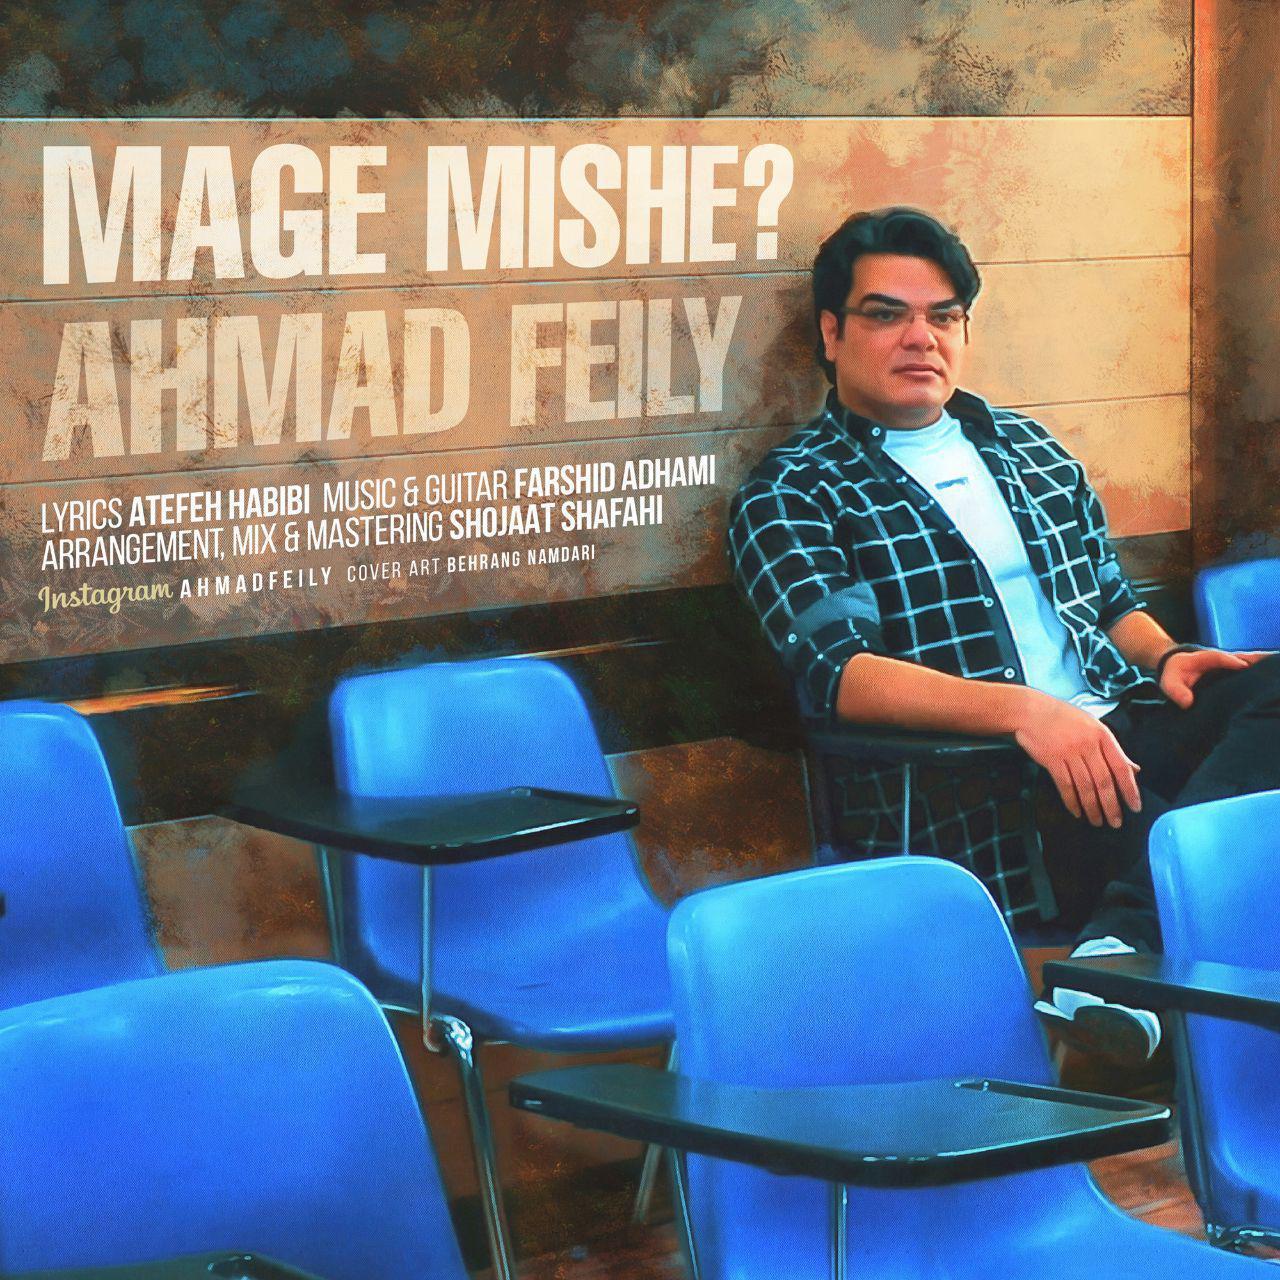 Ahmad Feily – Mage Mishe